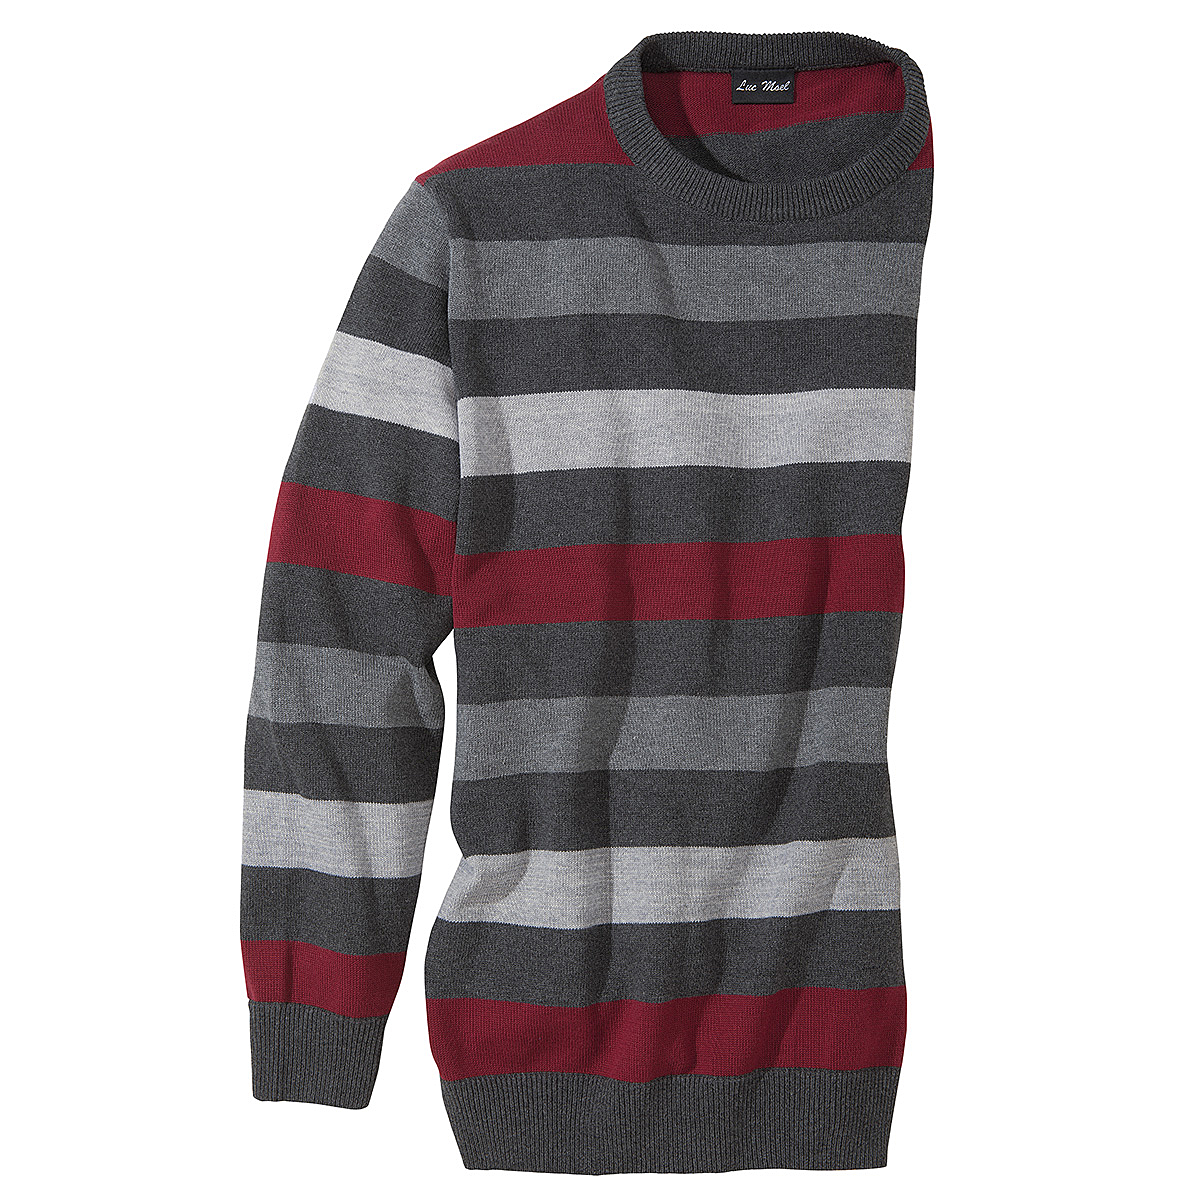 baumwoll pullover farbe grau rot gr enspezialist m nnermode. Black Bedroom Furniture Sets. Home Design Ideas